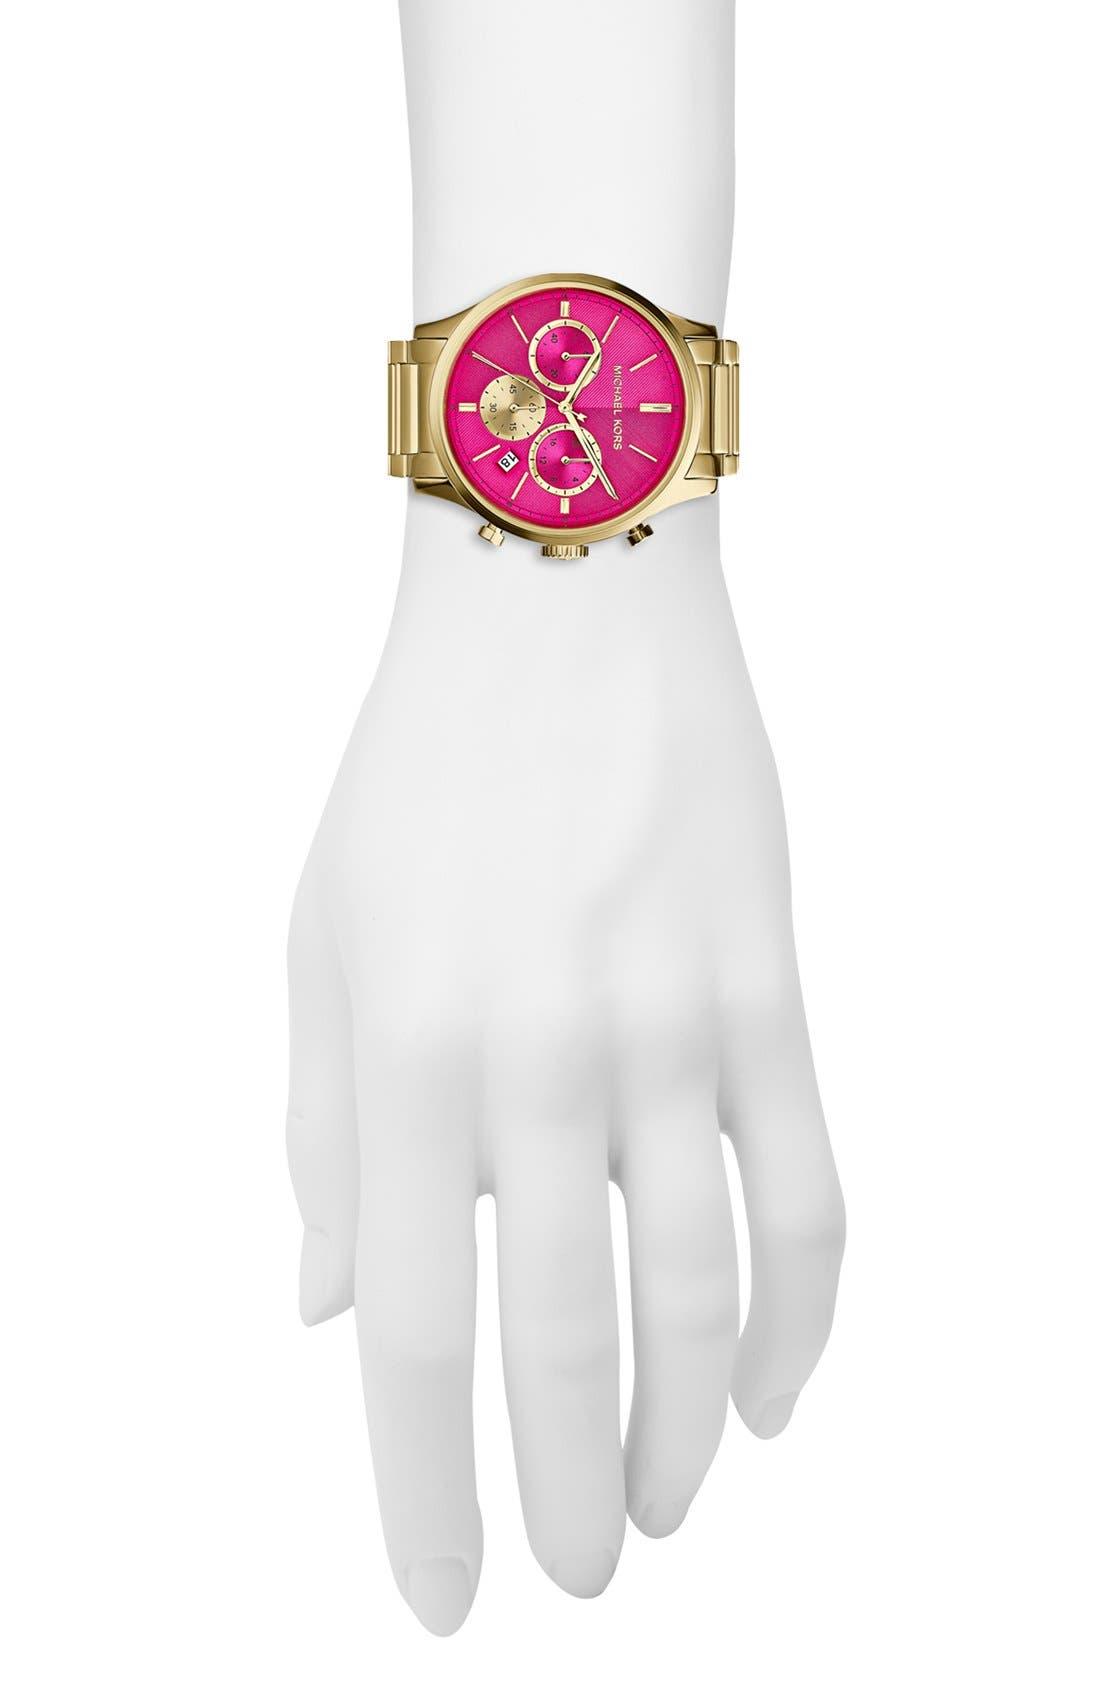 MICHAEL MICHAEL KORS,                             Michael Kors 'Bailey' Chronograph Bracelet Watch, 44mm,                             Alternate thumbnail 4, color,                             710